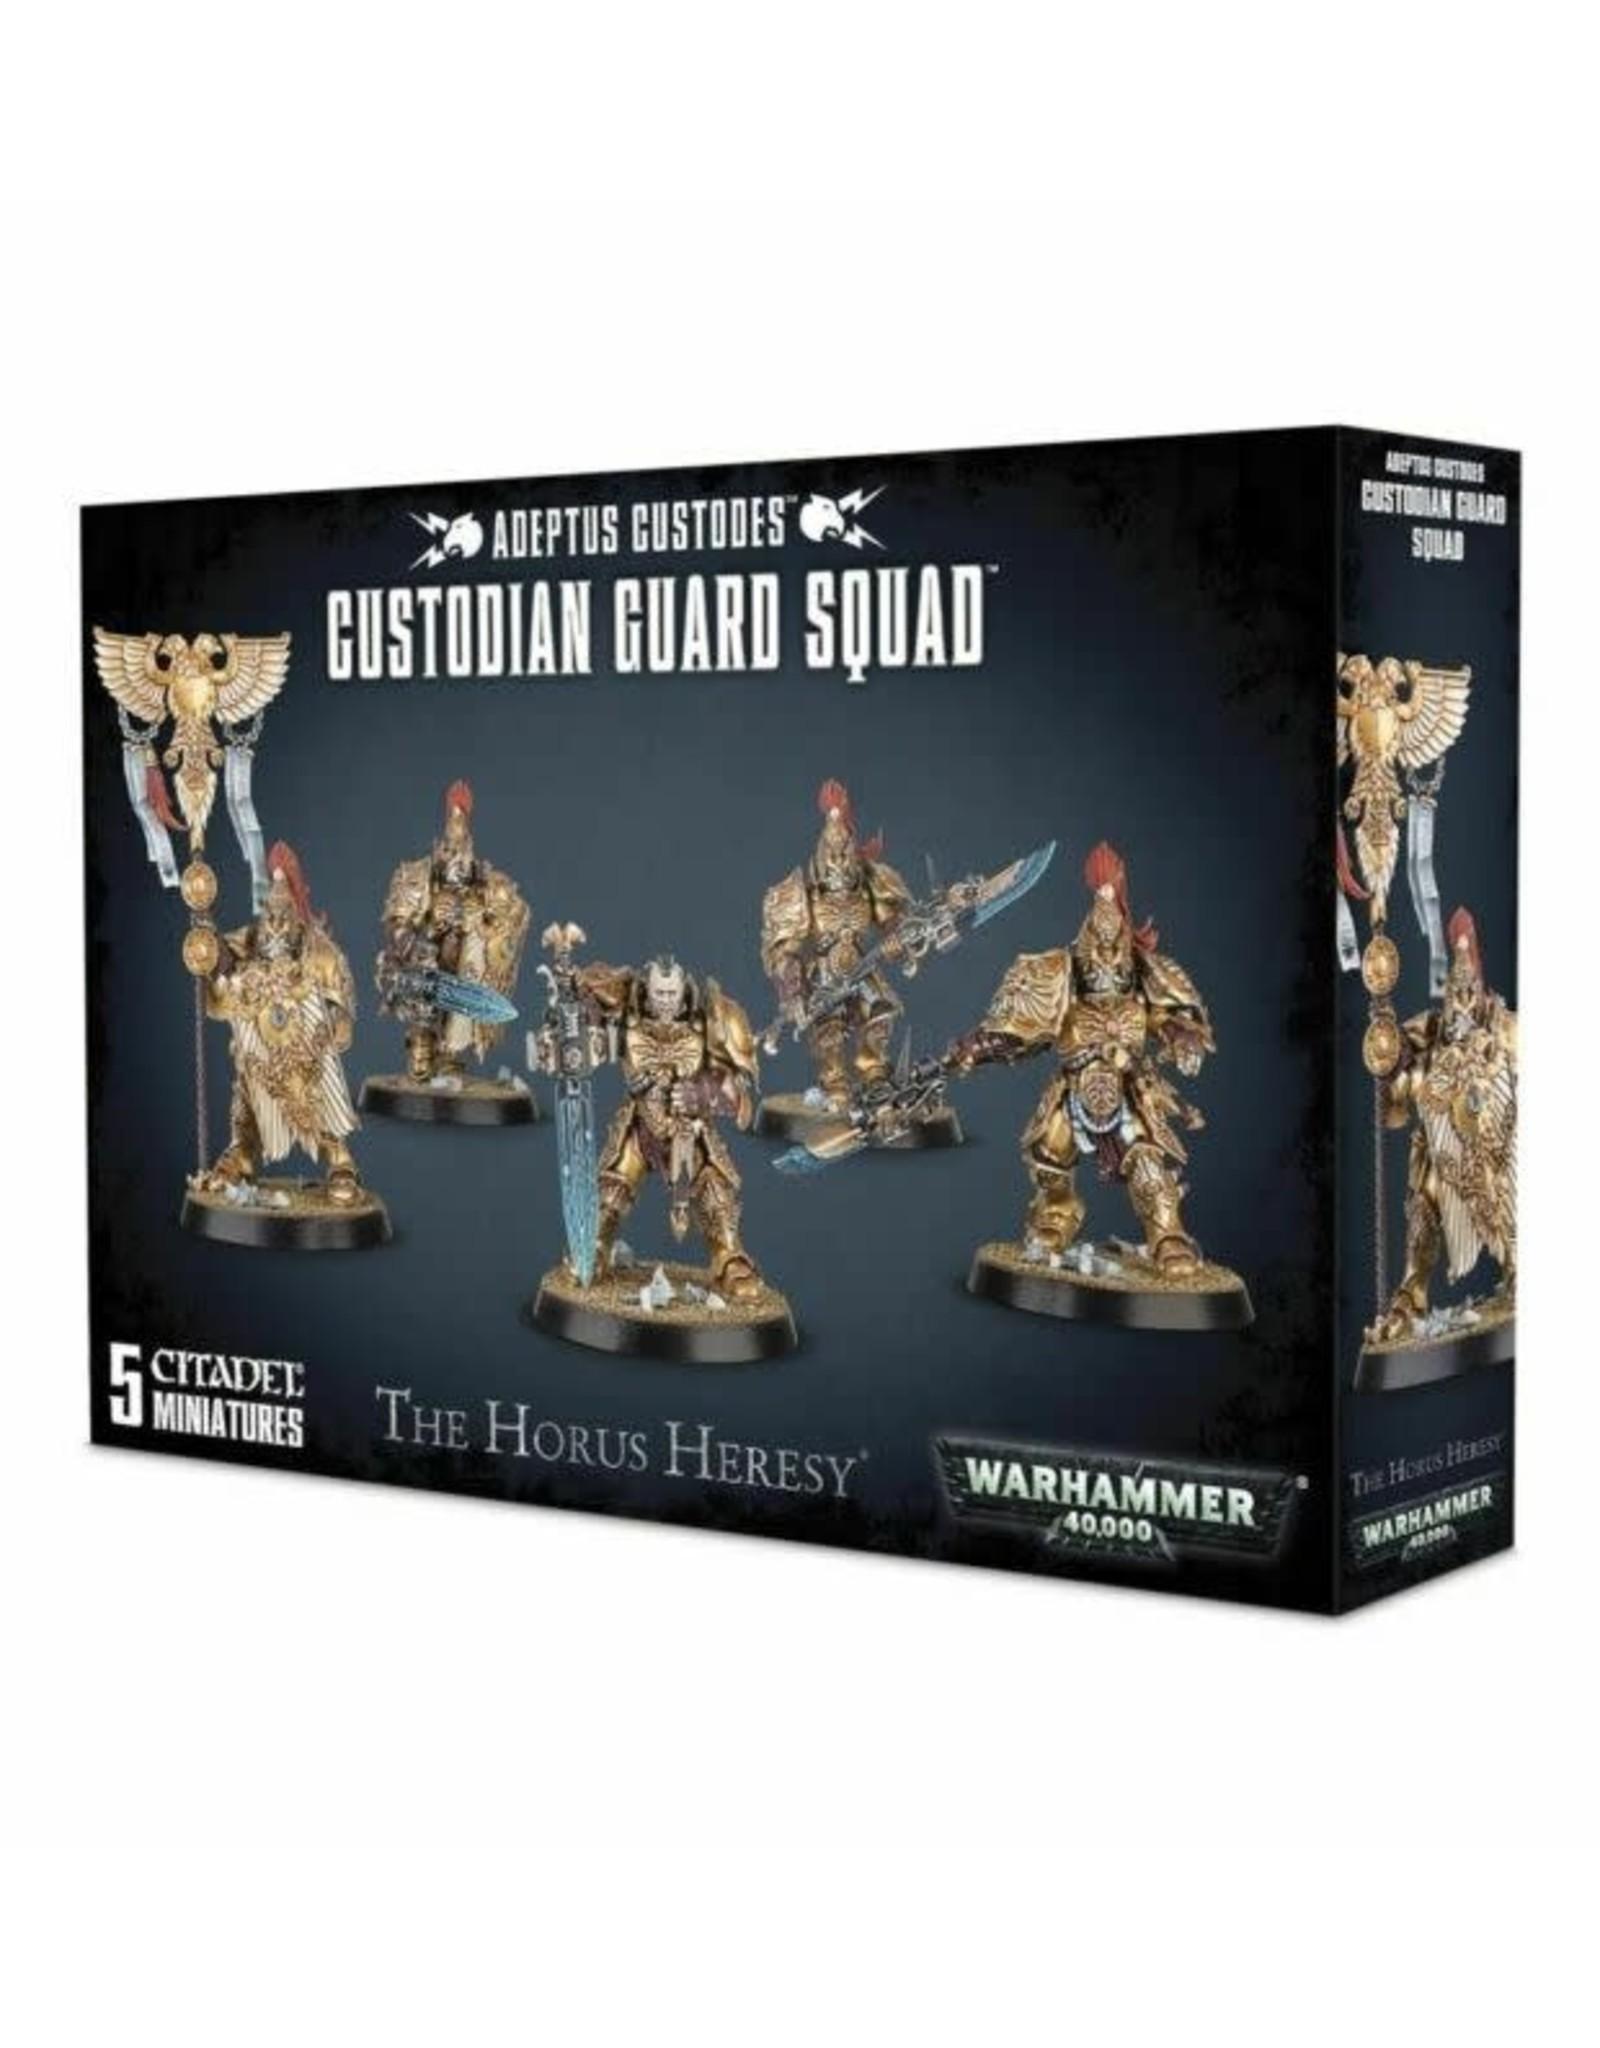 Warhammer 40,000 Adeptus Custodes: Custodian Guard Squad